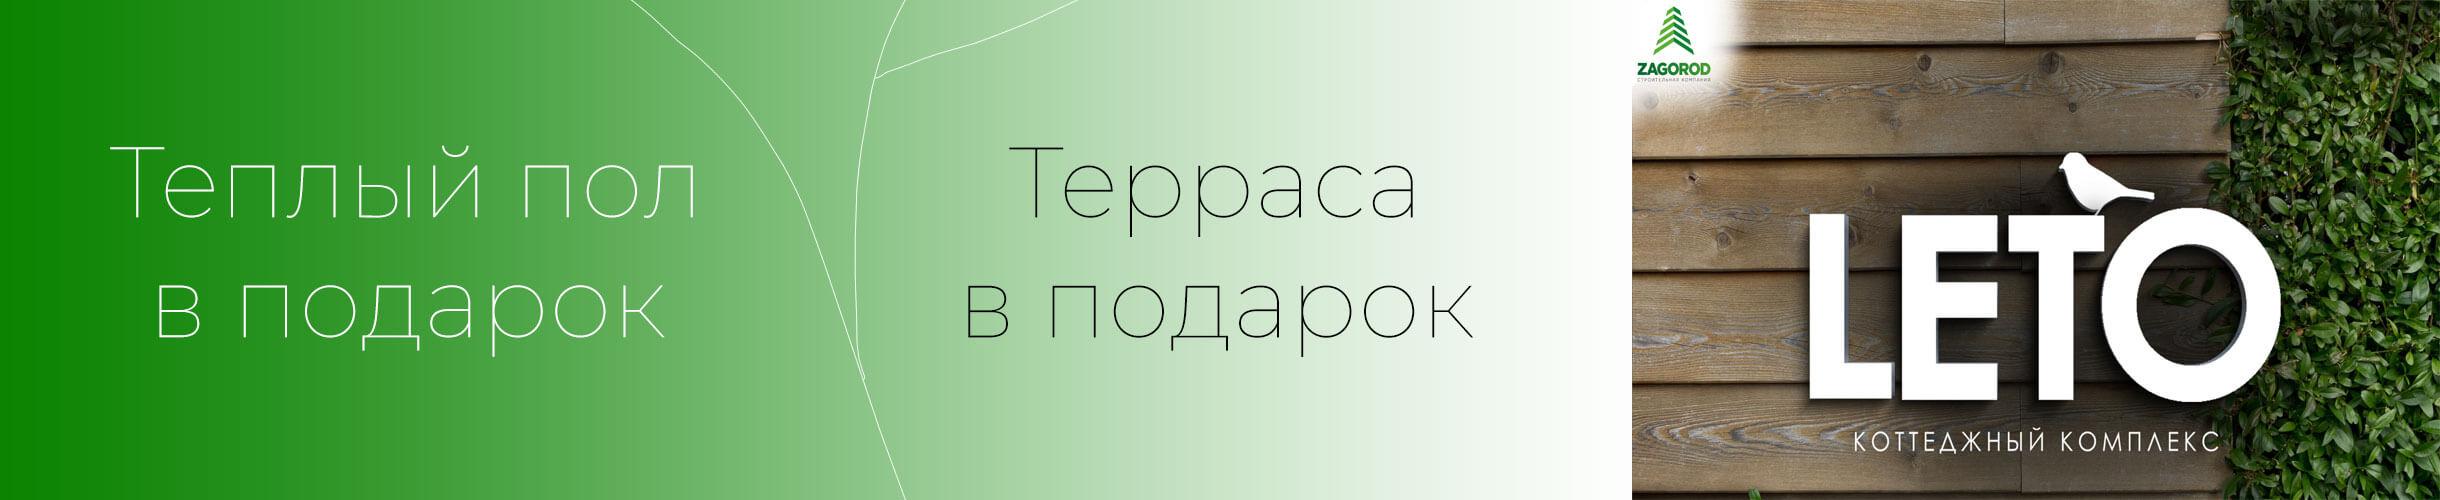 КП Лето (Leto)